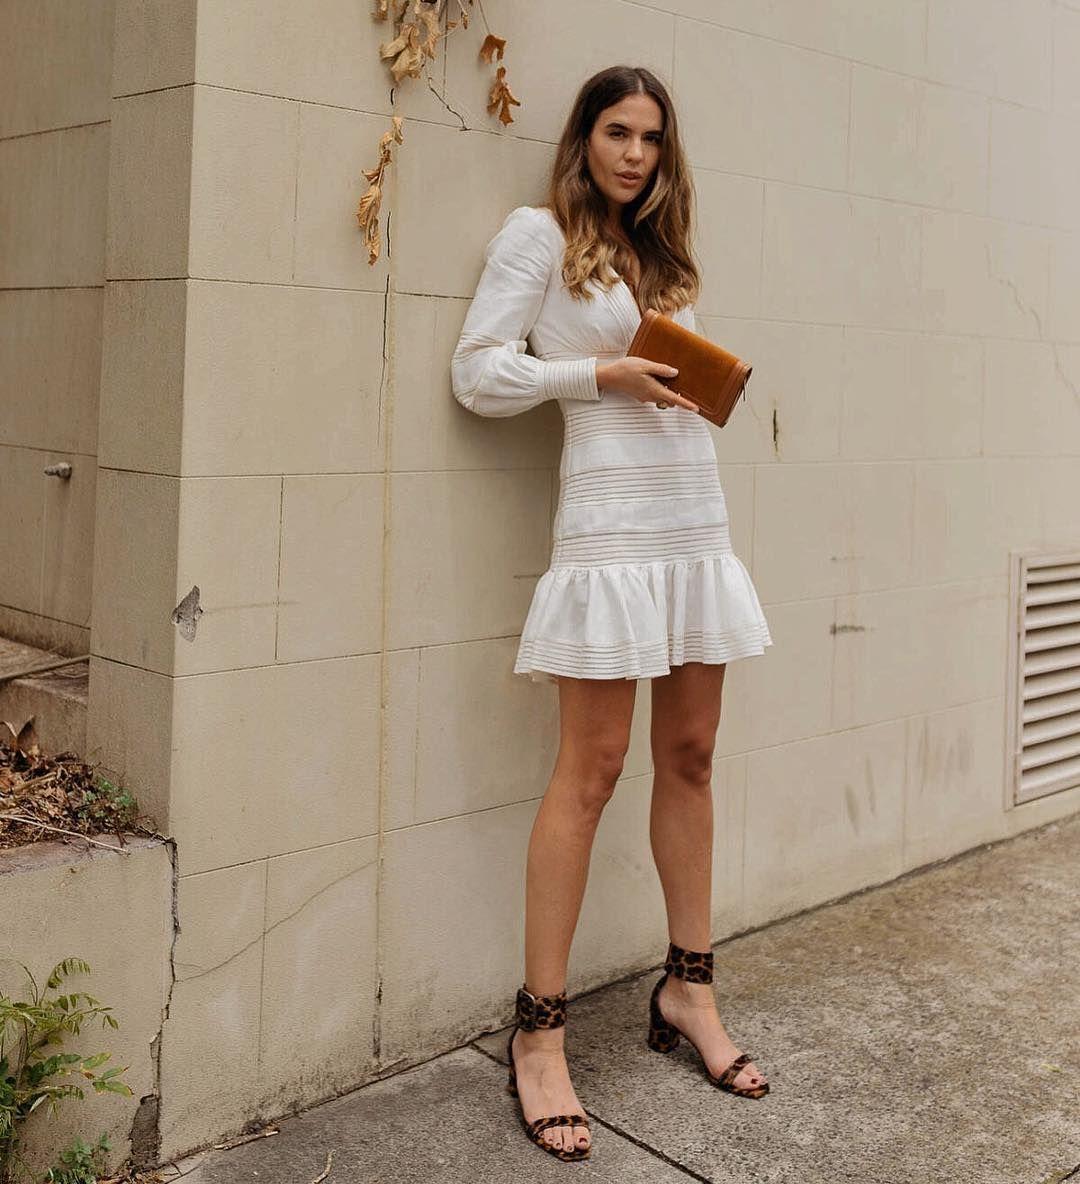 Piper Rockelle 12/18/2020 | Fashion, White dress, Dresses